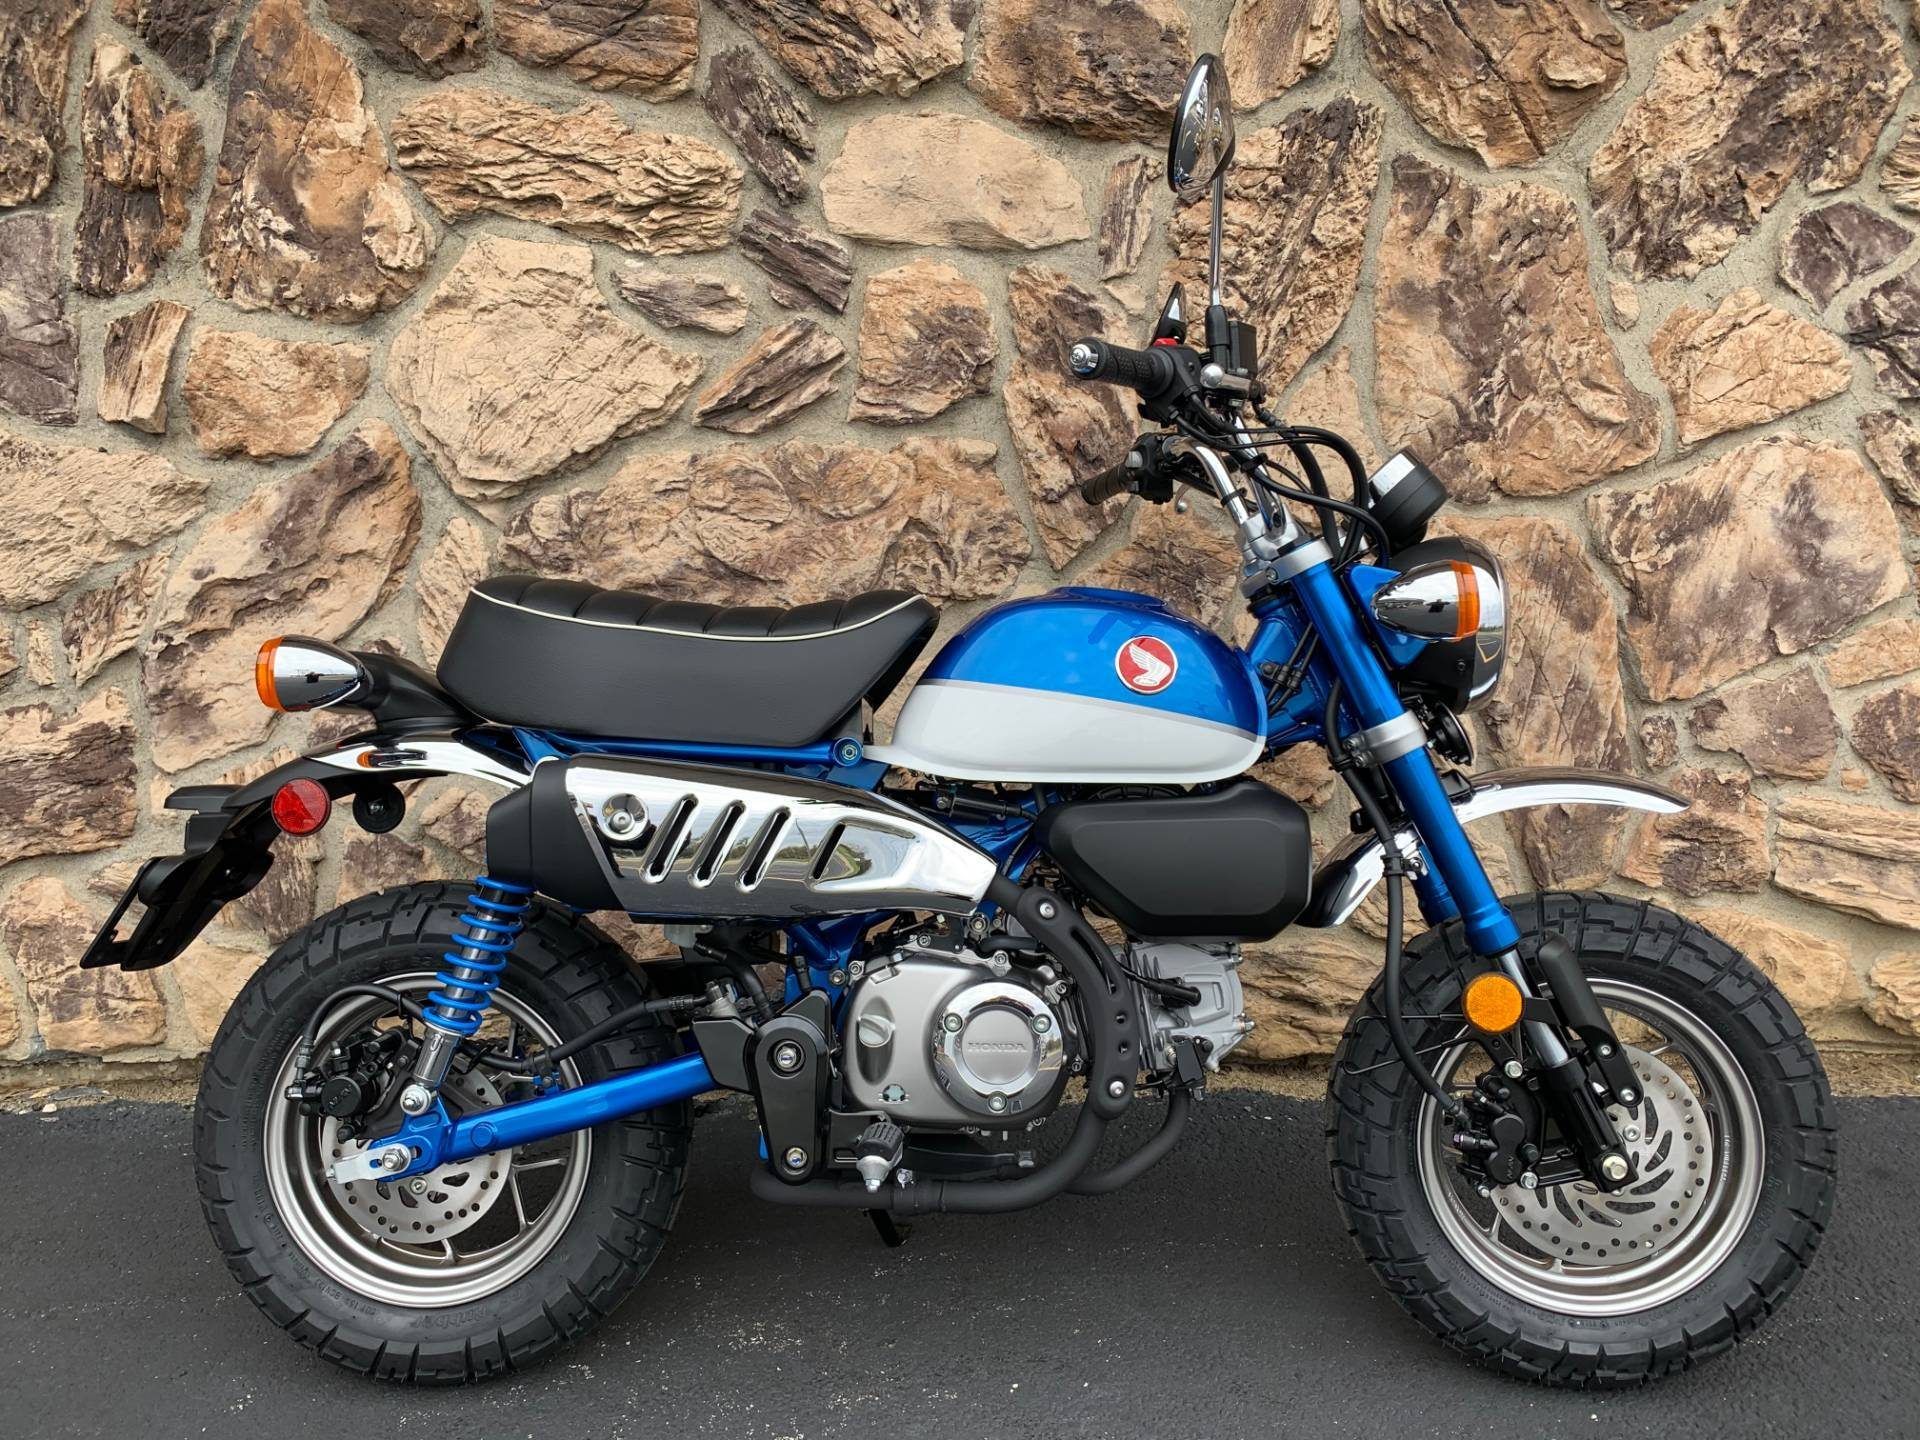 New 2021 Honda Monkey Motorcycles in Aurora, IL | Stock ...